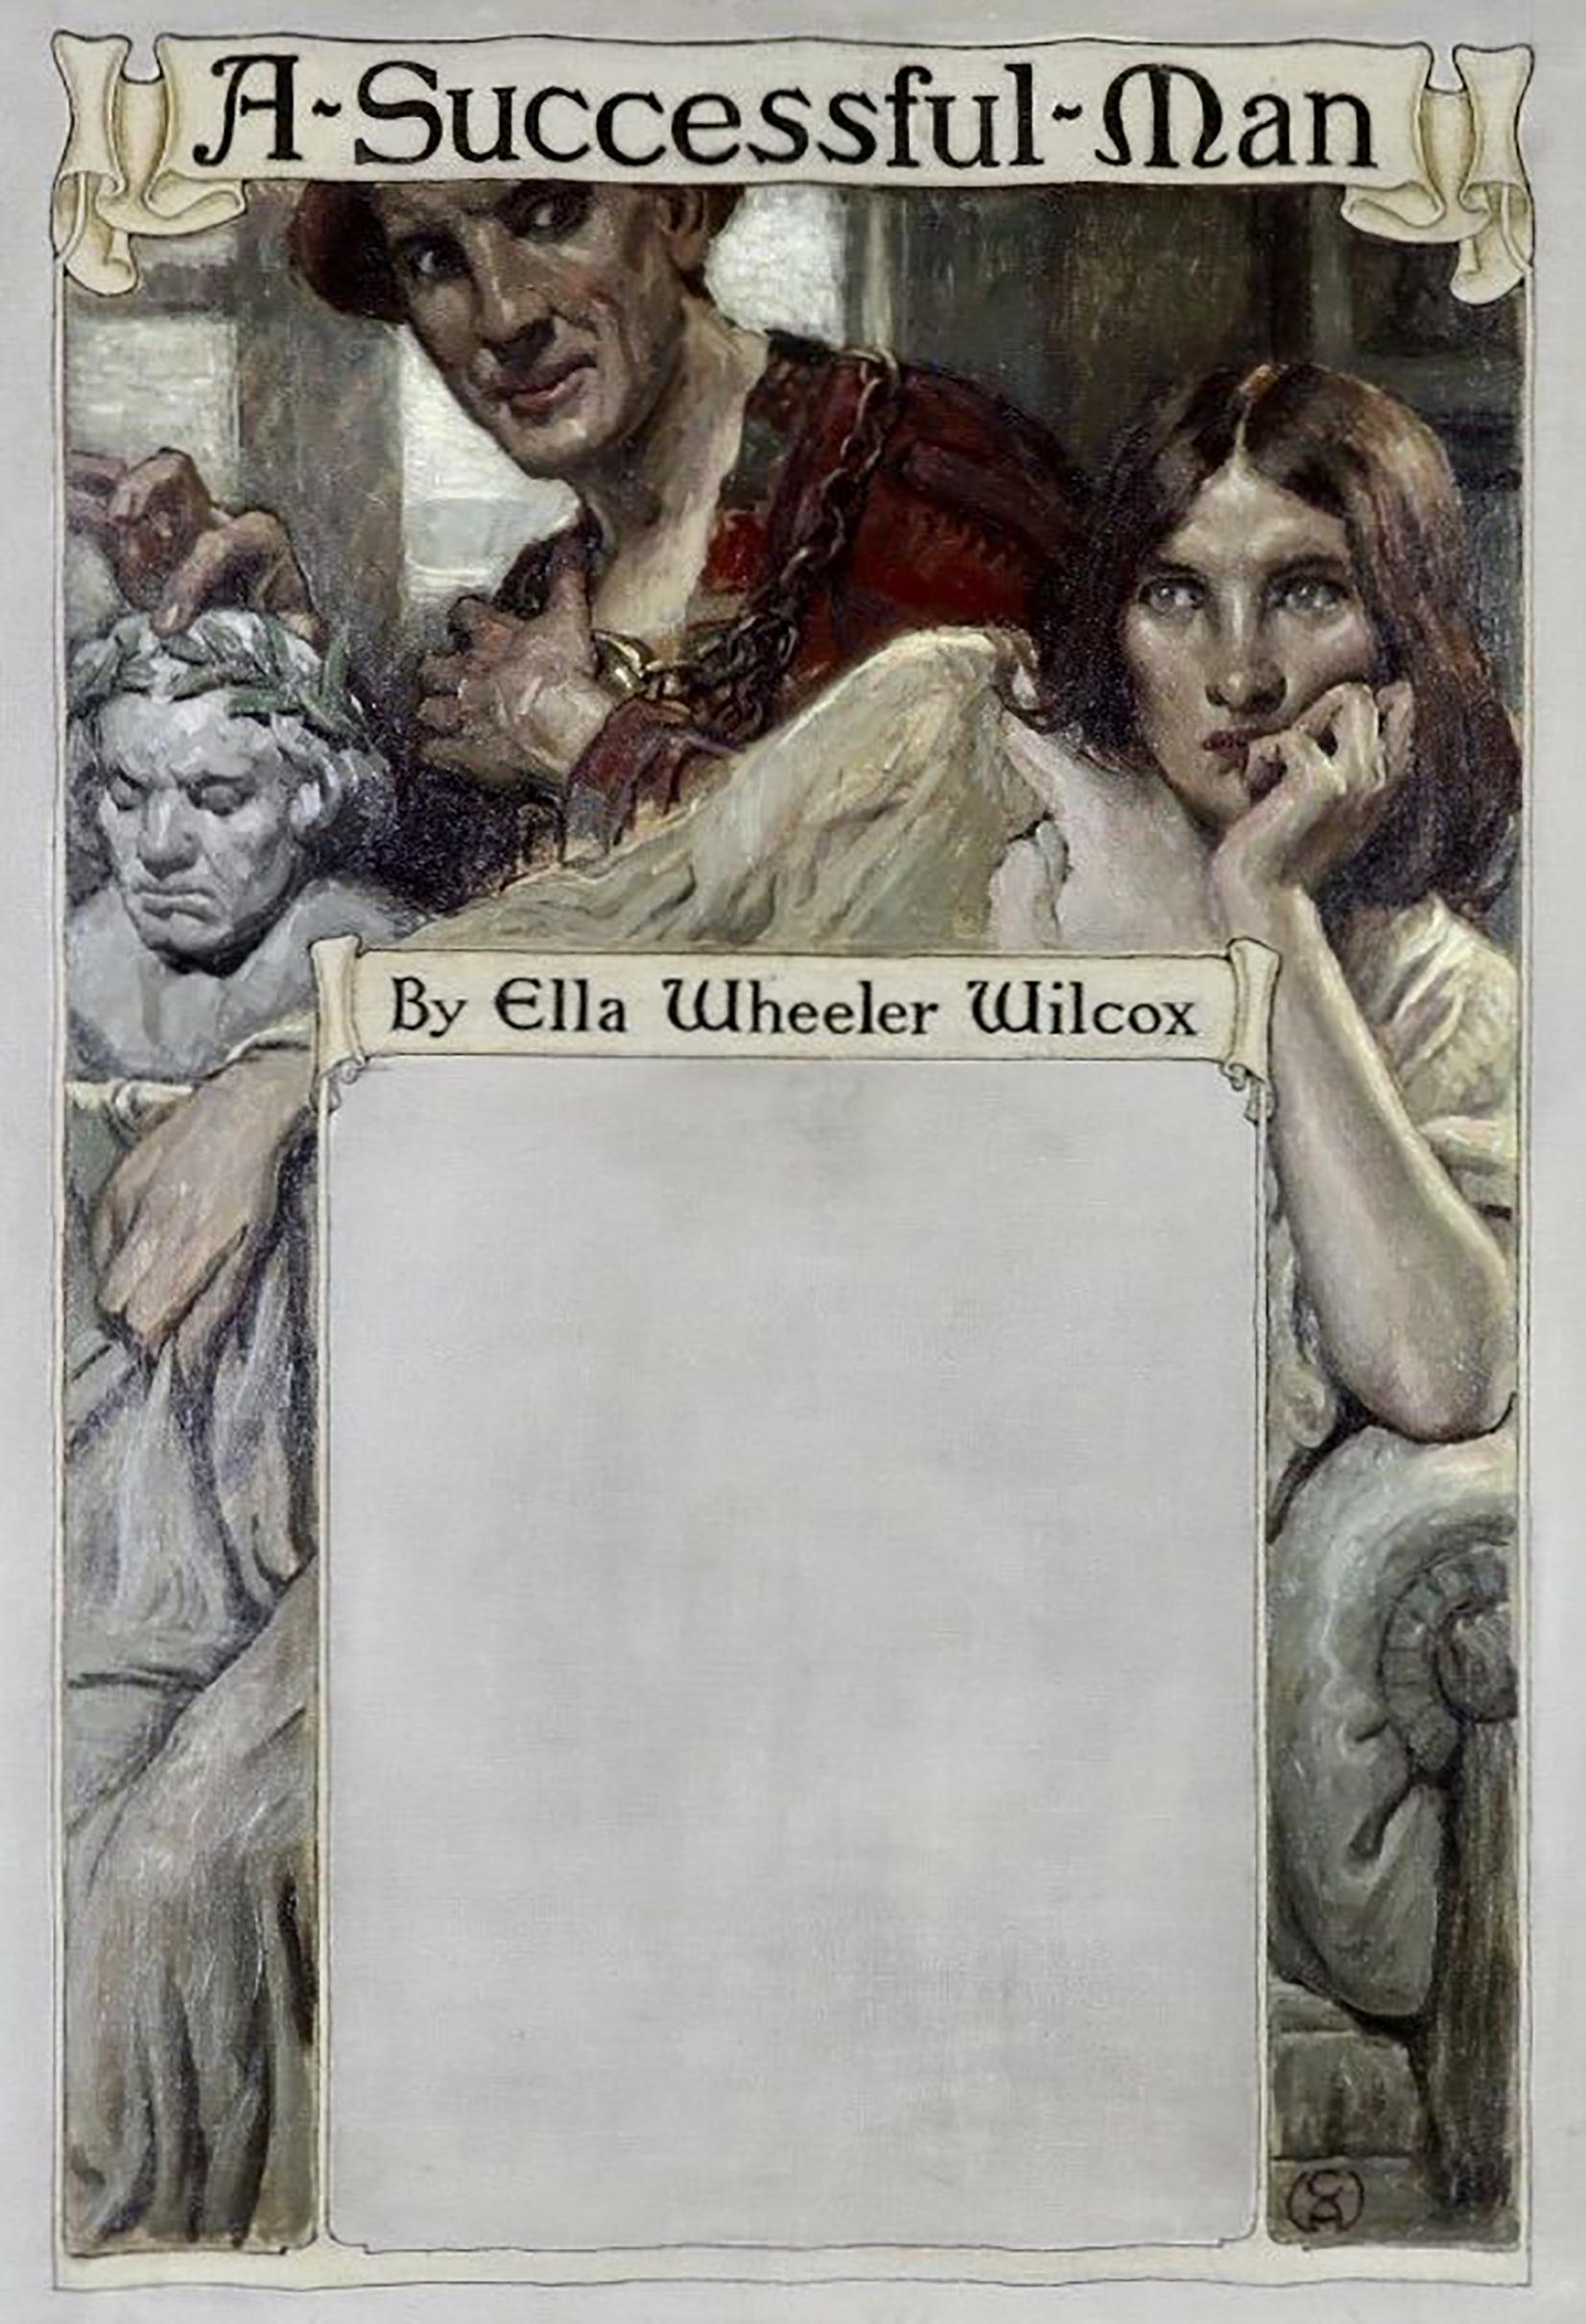 """A Successful Man"" by Ella Wheeler Wilcox, 1919"